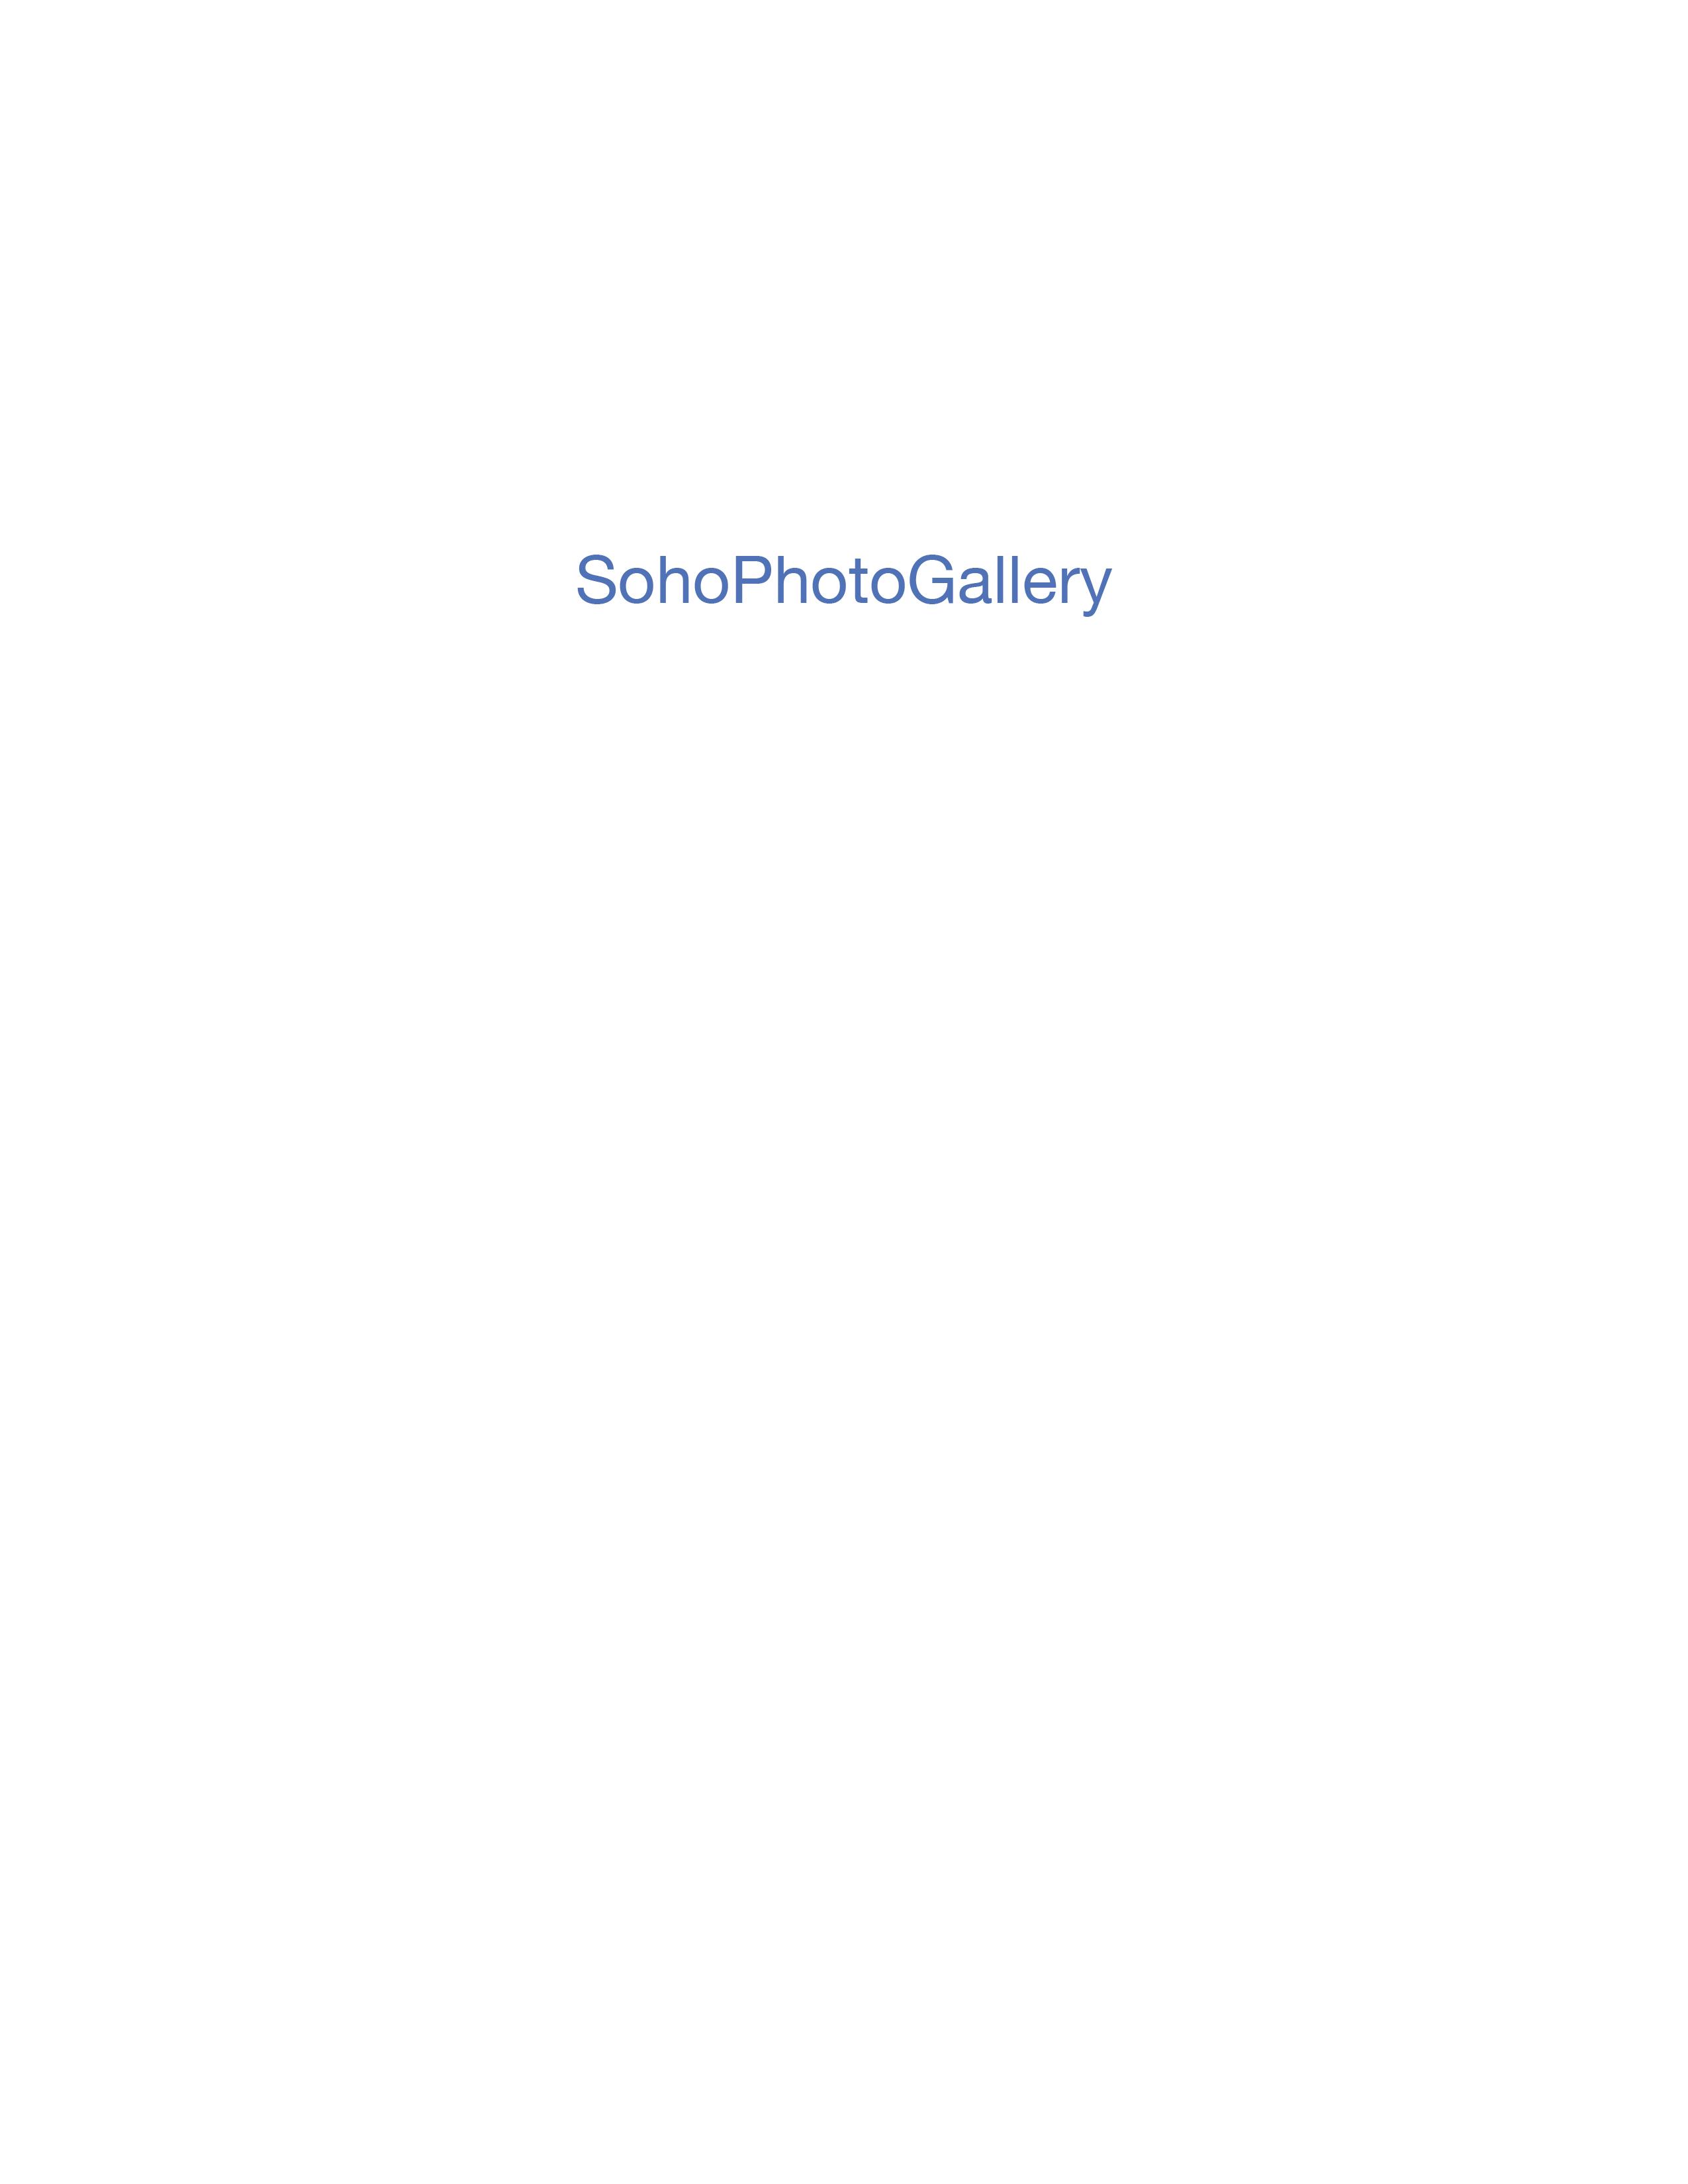 Soho Photo Gallery's International Portfolio Competition